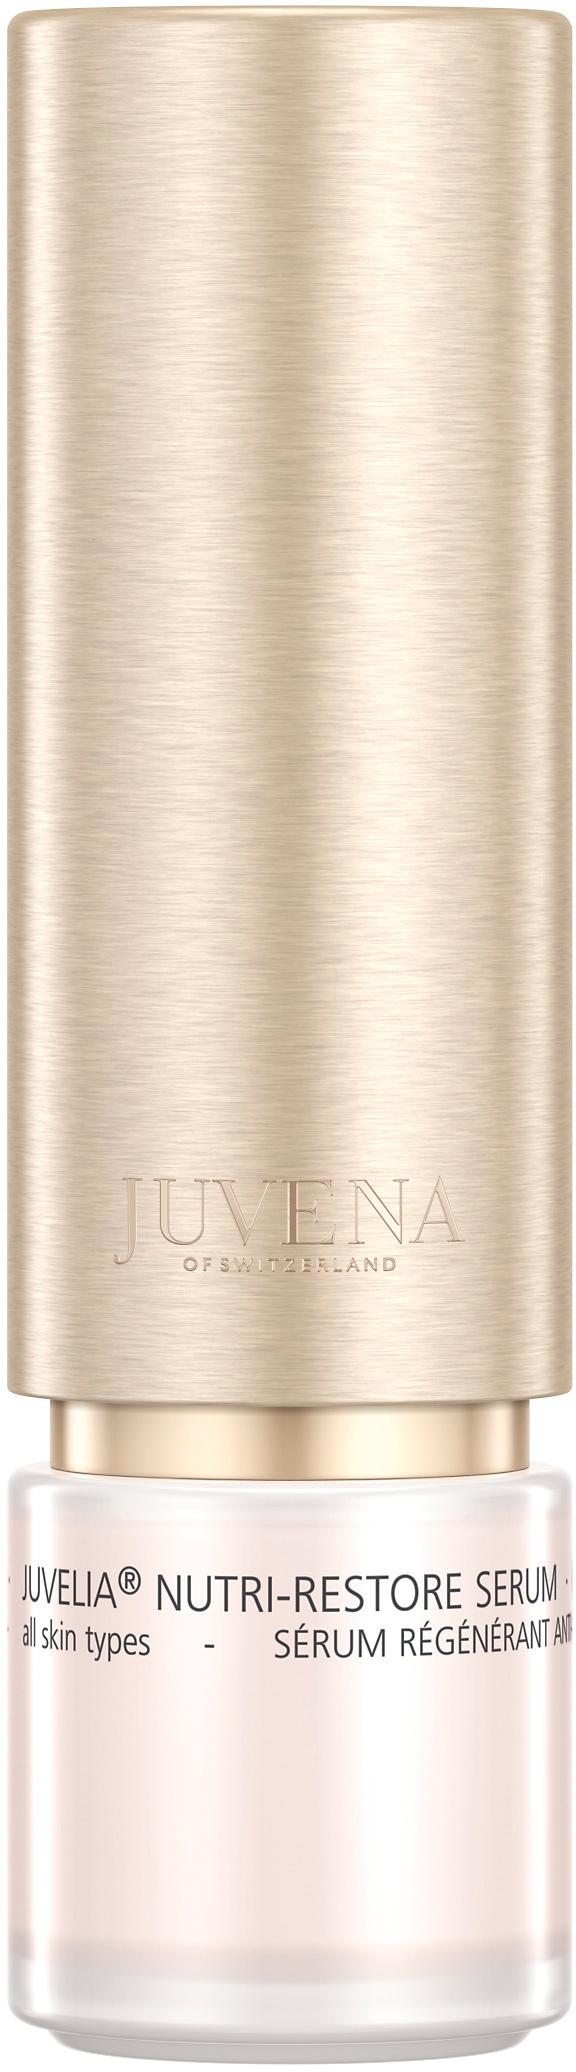 Juvena Juvelia Nutri Restore Serum 30 ml